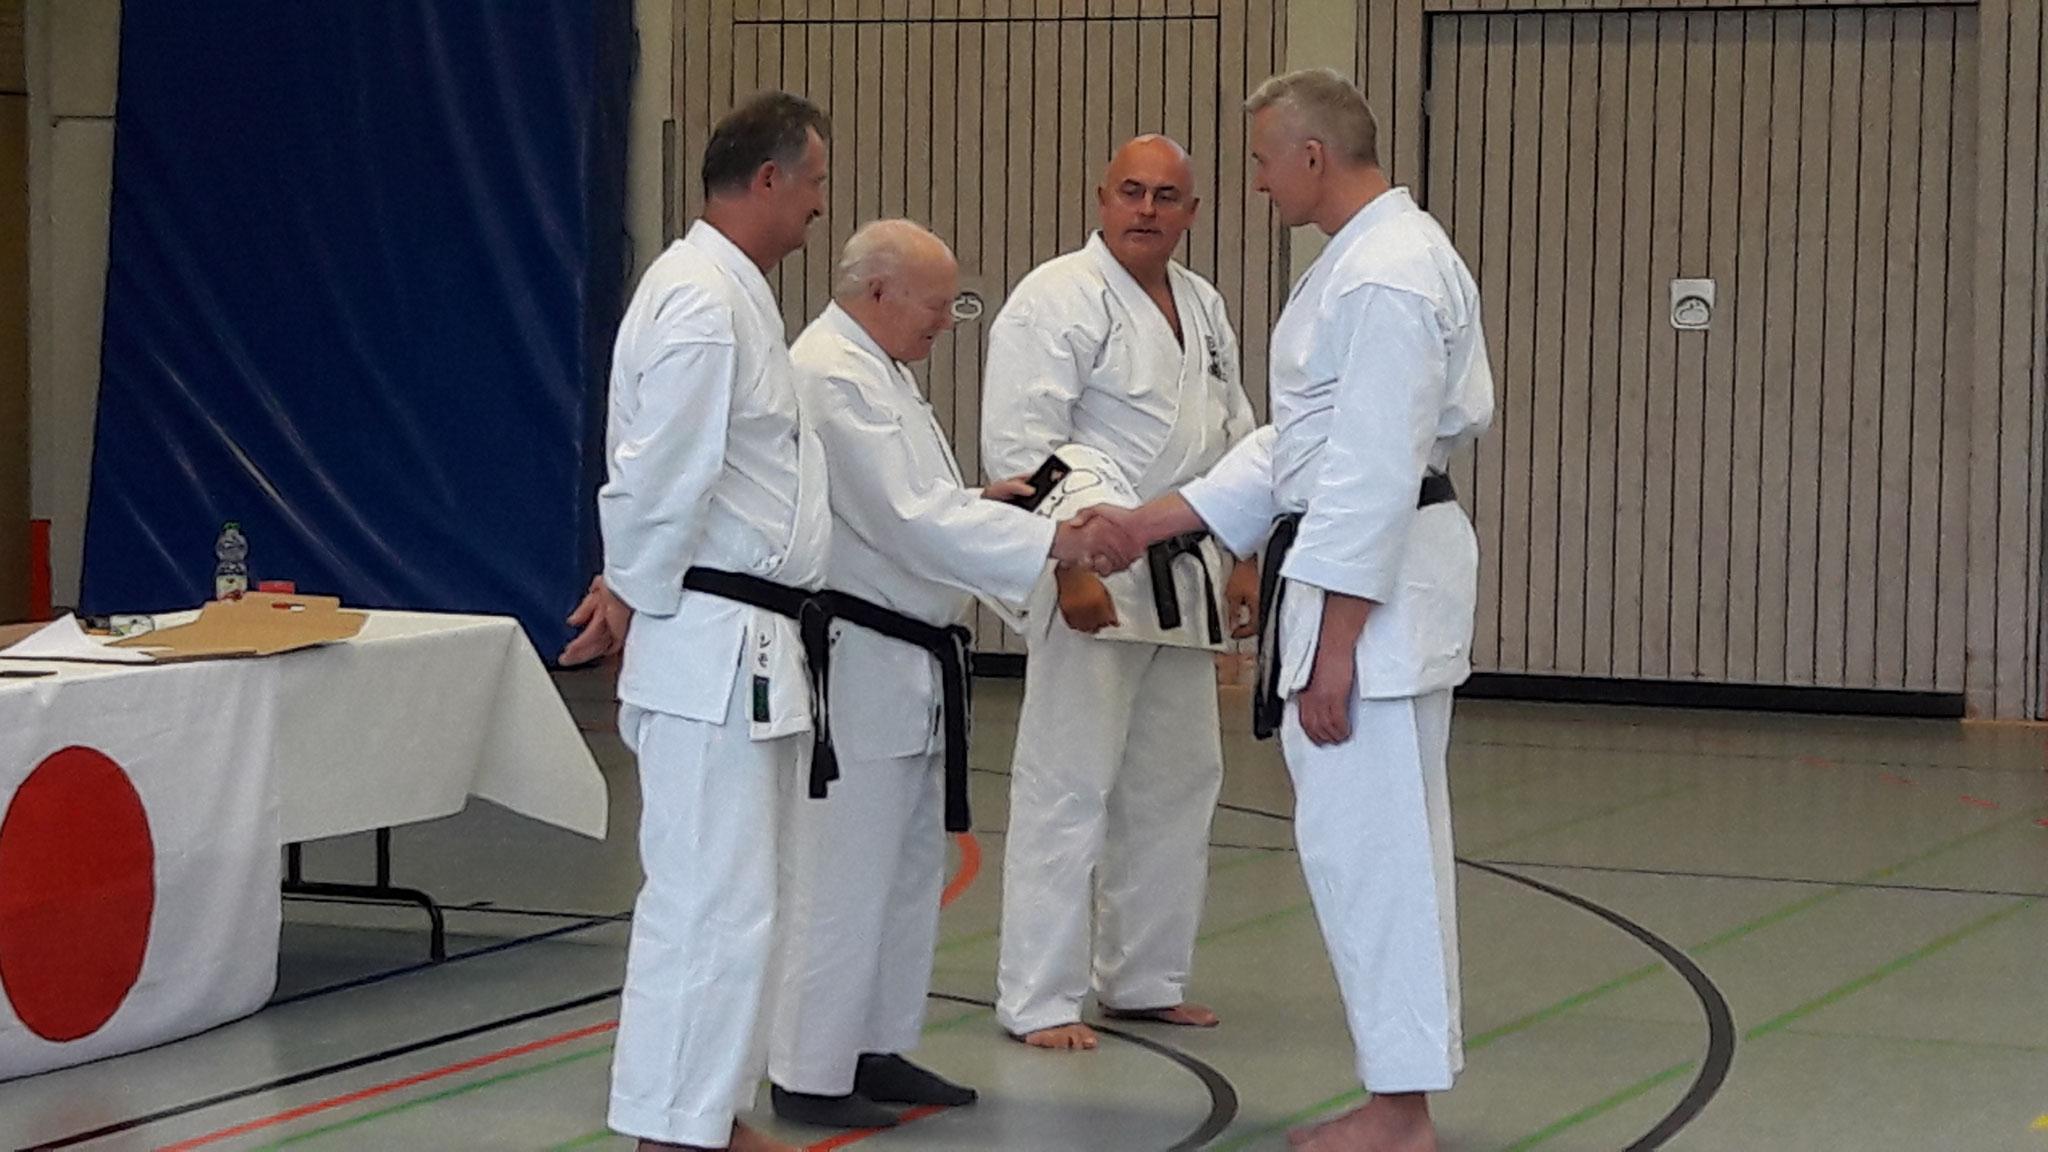 Karate Dan Prüfung von Gerd Wegner Glückwunsch zum 4.Dan